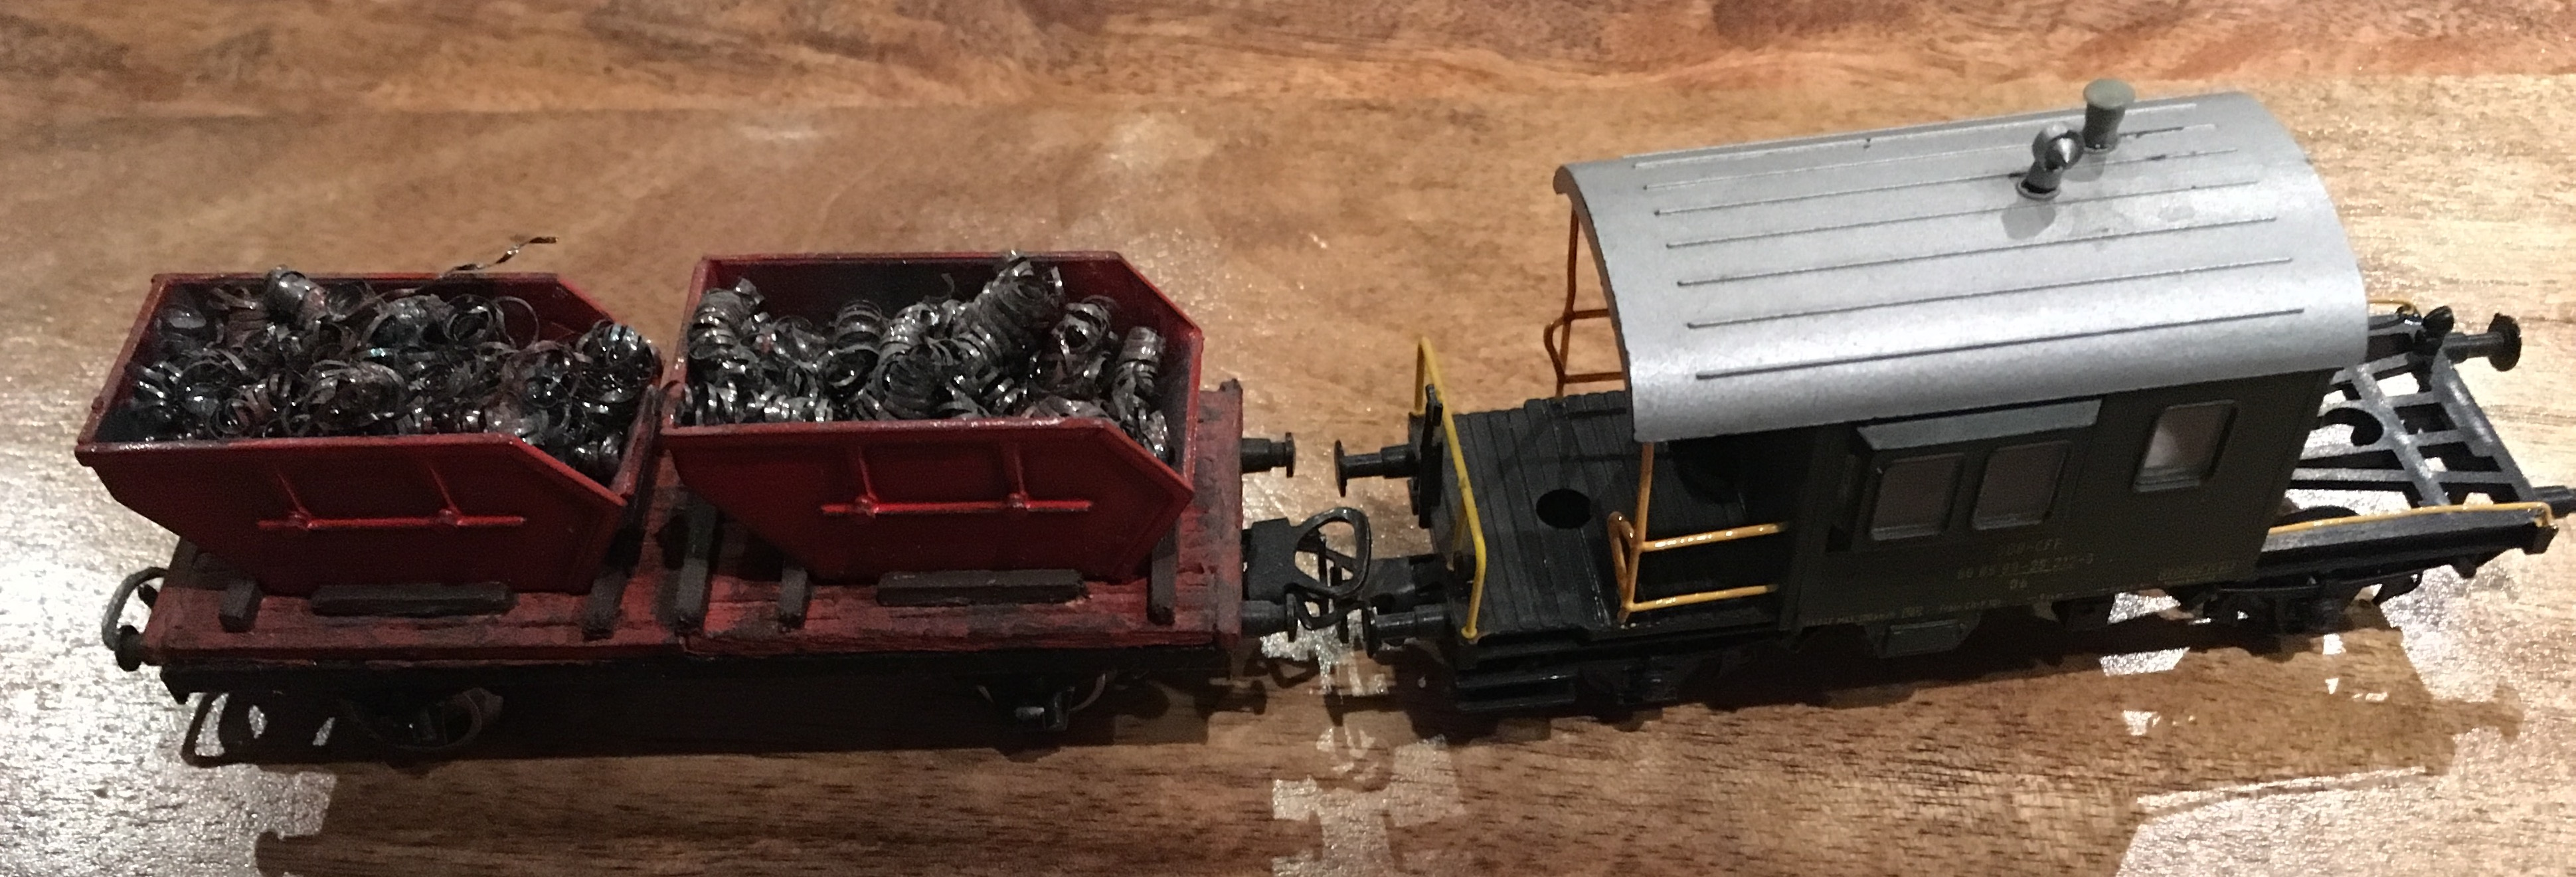 Sputnik & Wagon Plat